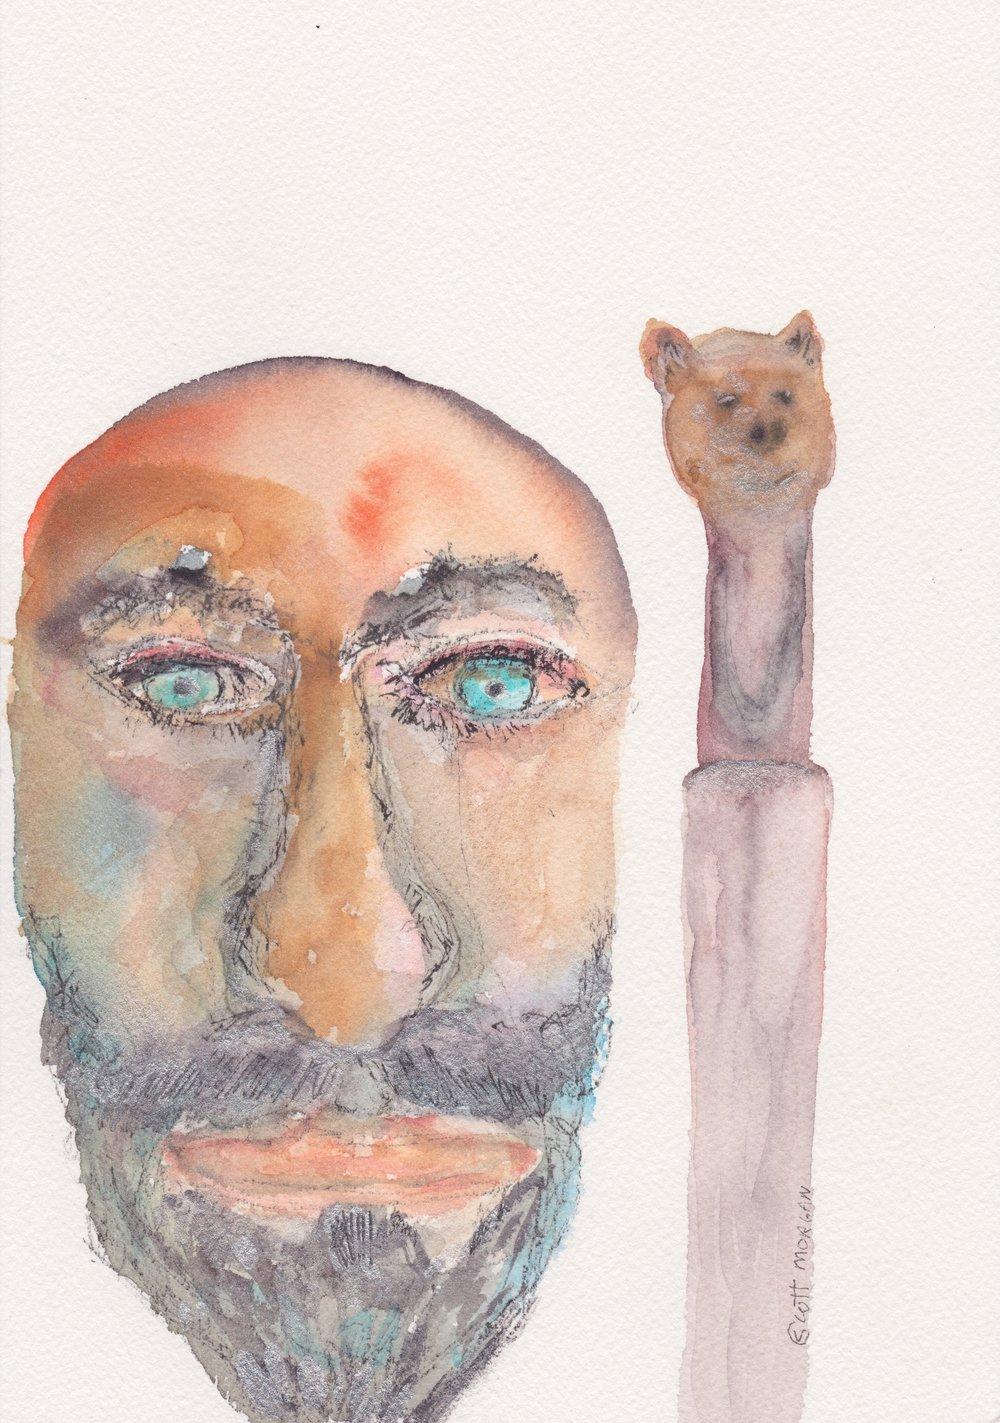 Self portrait with bear walking stick.